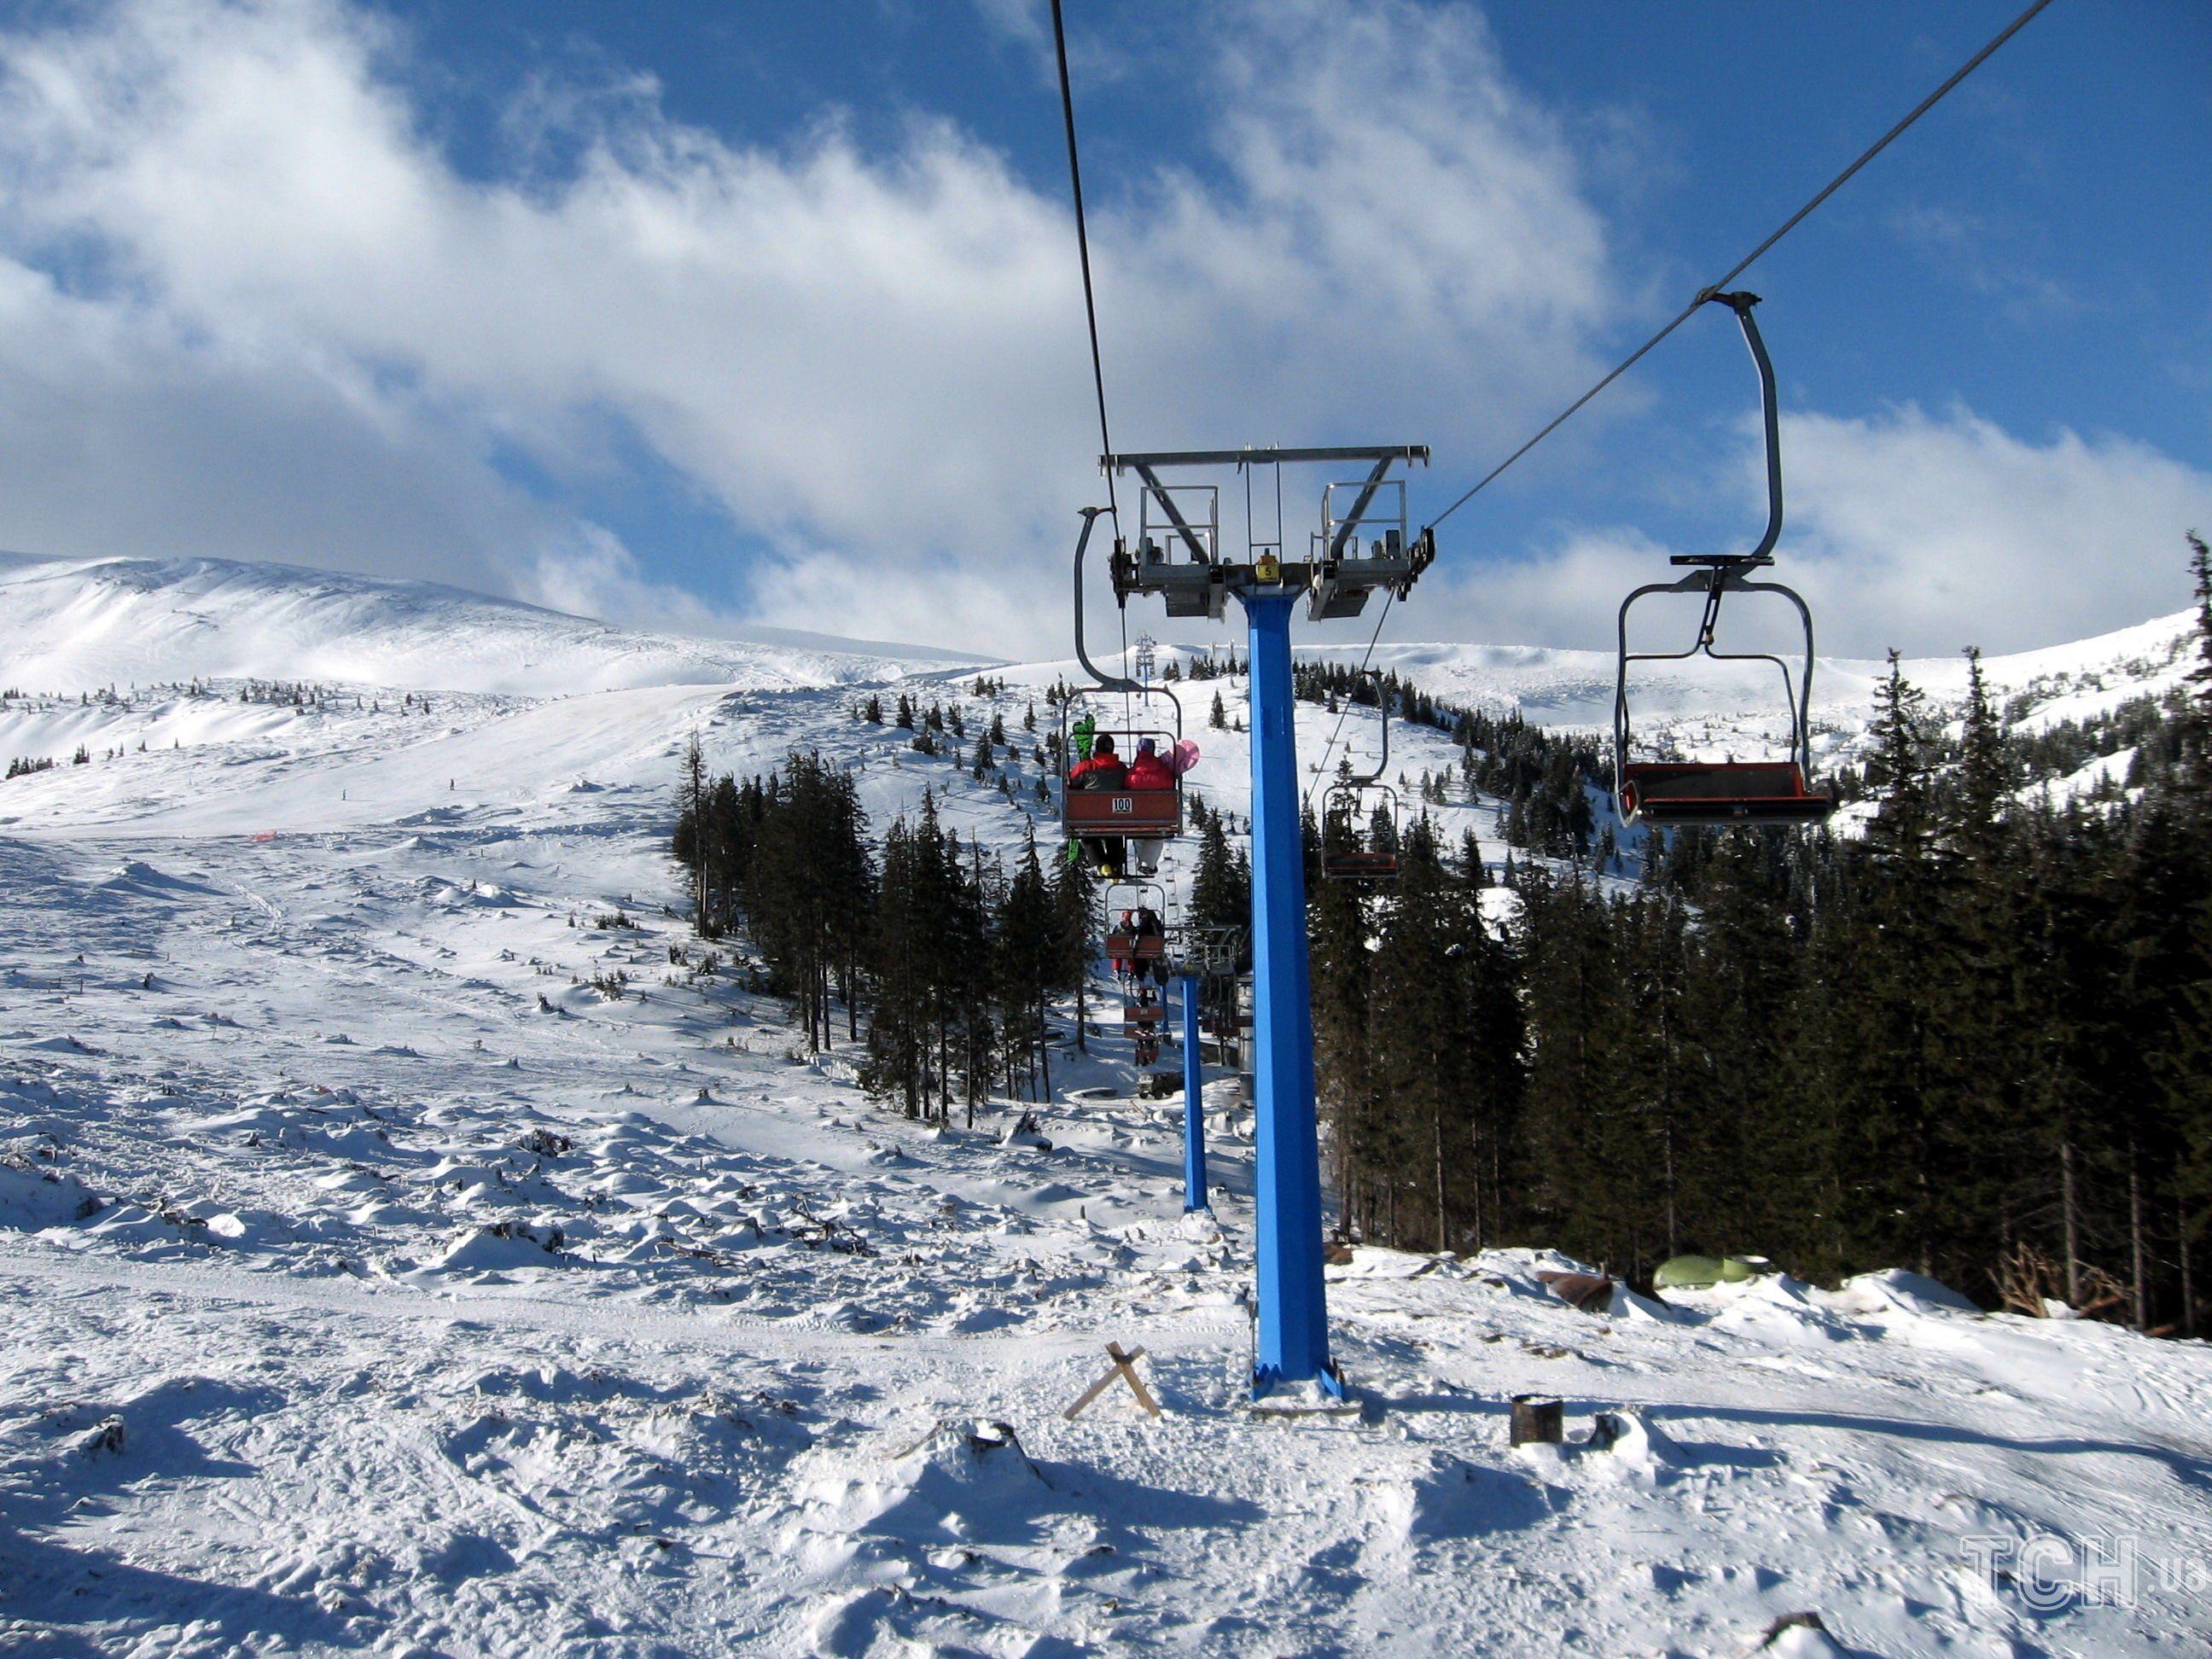 лыжный курорт Драгобрат, горнолыжный курорт, подъемник на Драгобрате